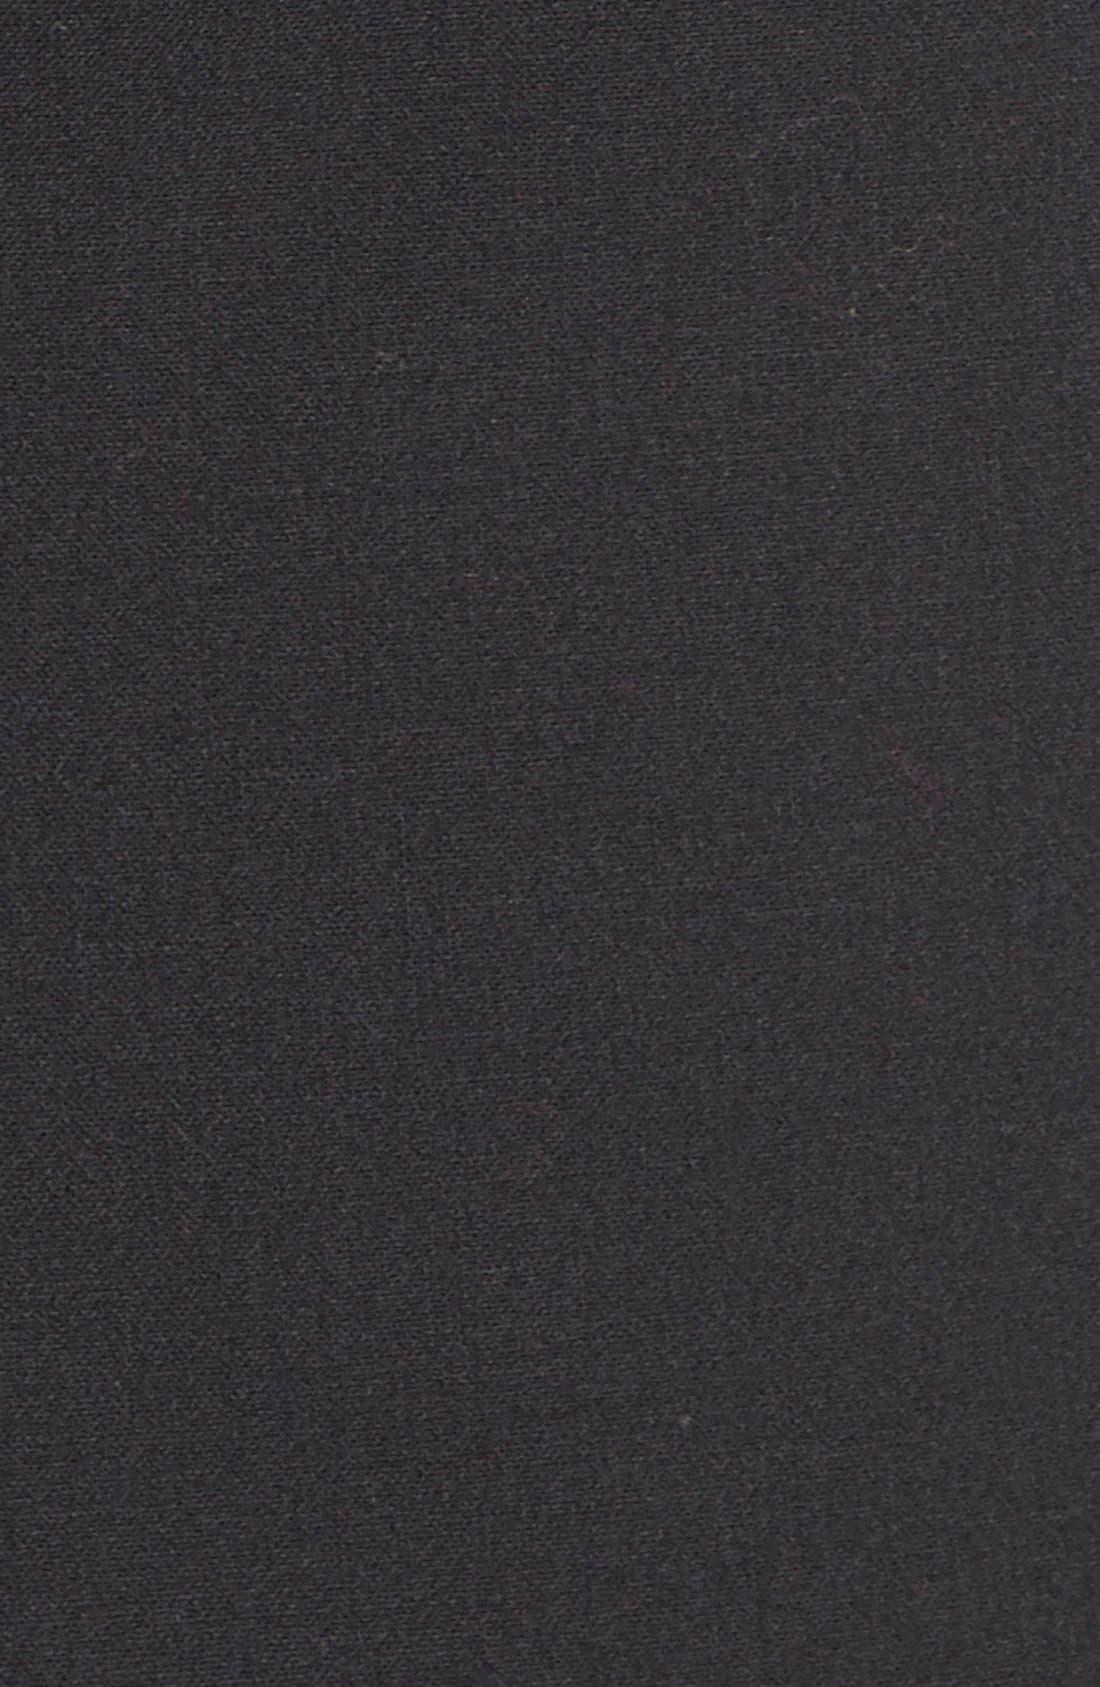 'Gladstone' Stretch Wool Jacket,                             Alternate thumbnail 4, color,                             Black